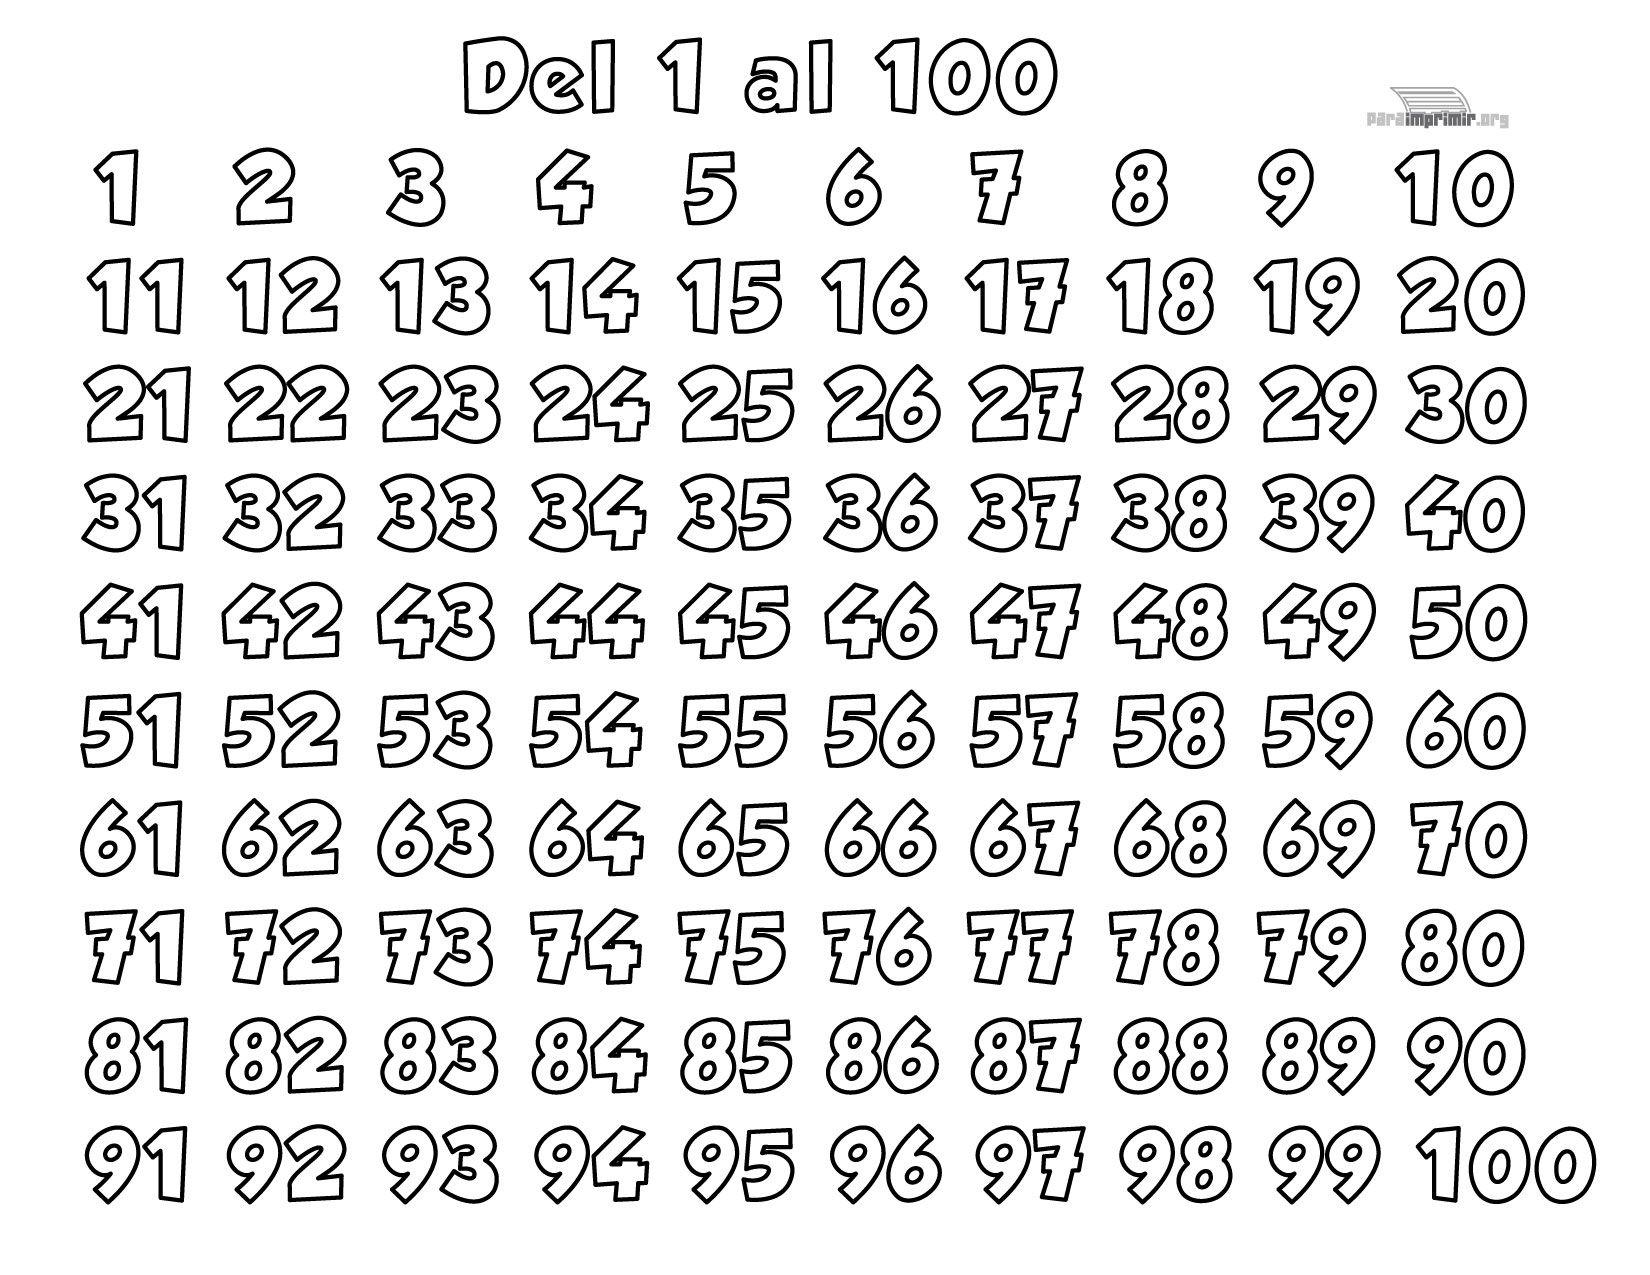 Pin De Cristina Barboza En Mate Imprimir Sobres Números Y Numero